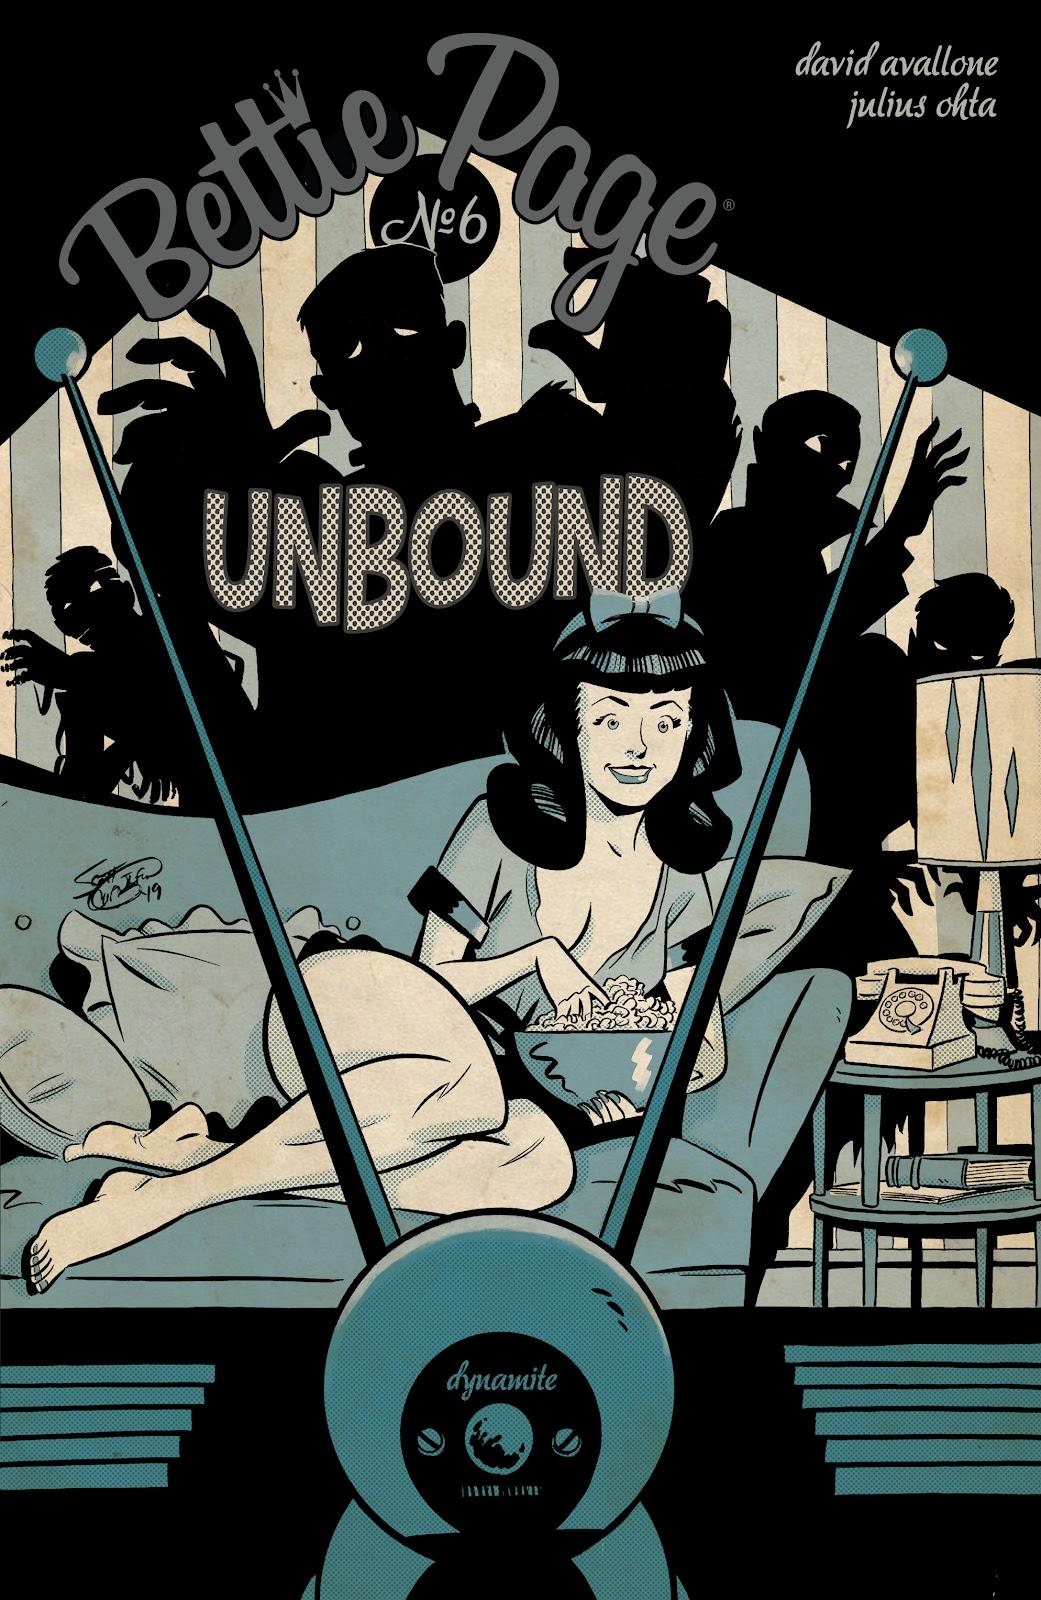 Read online Bettie Page: Unbound comic -  Issue #6 - 2